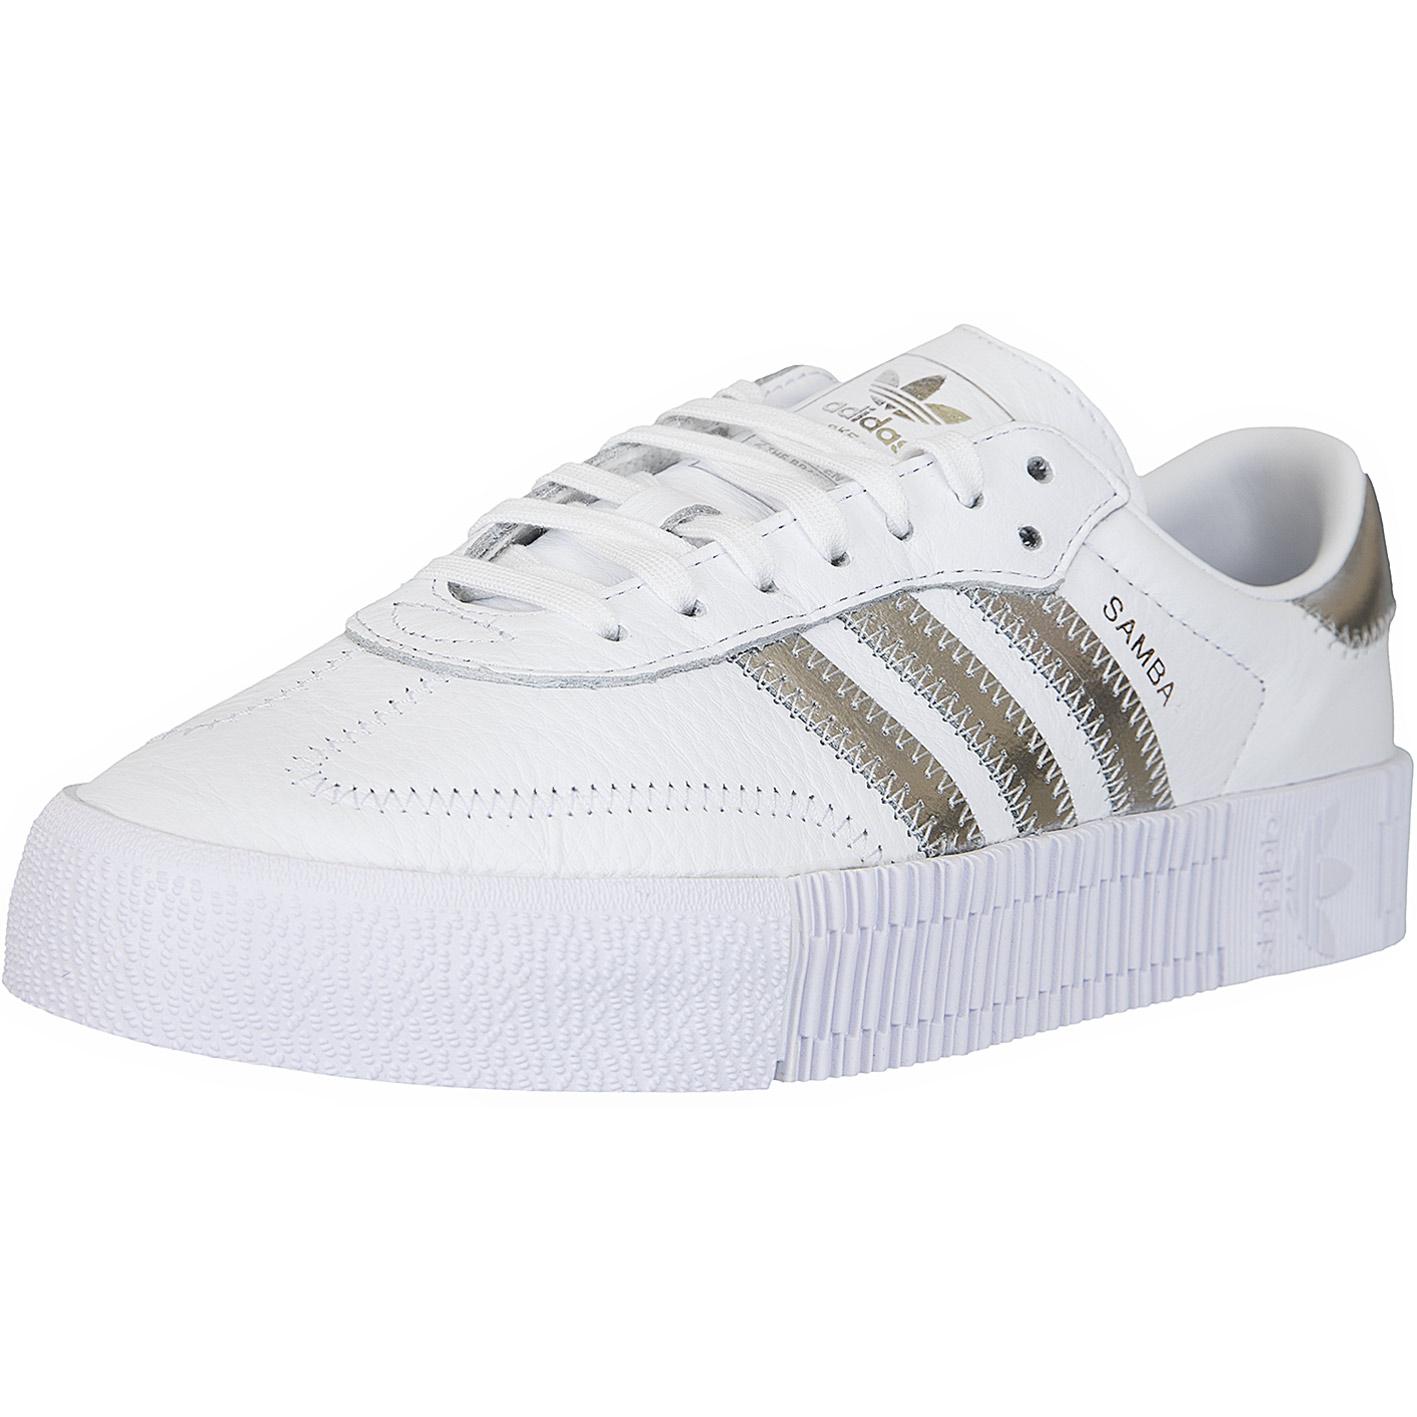 Adidas Originals Damen Sneaker Sambarose weiß/silber